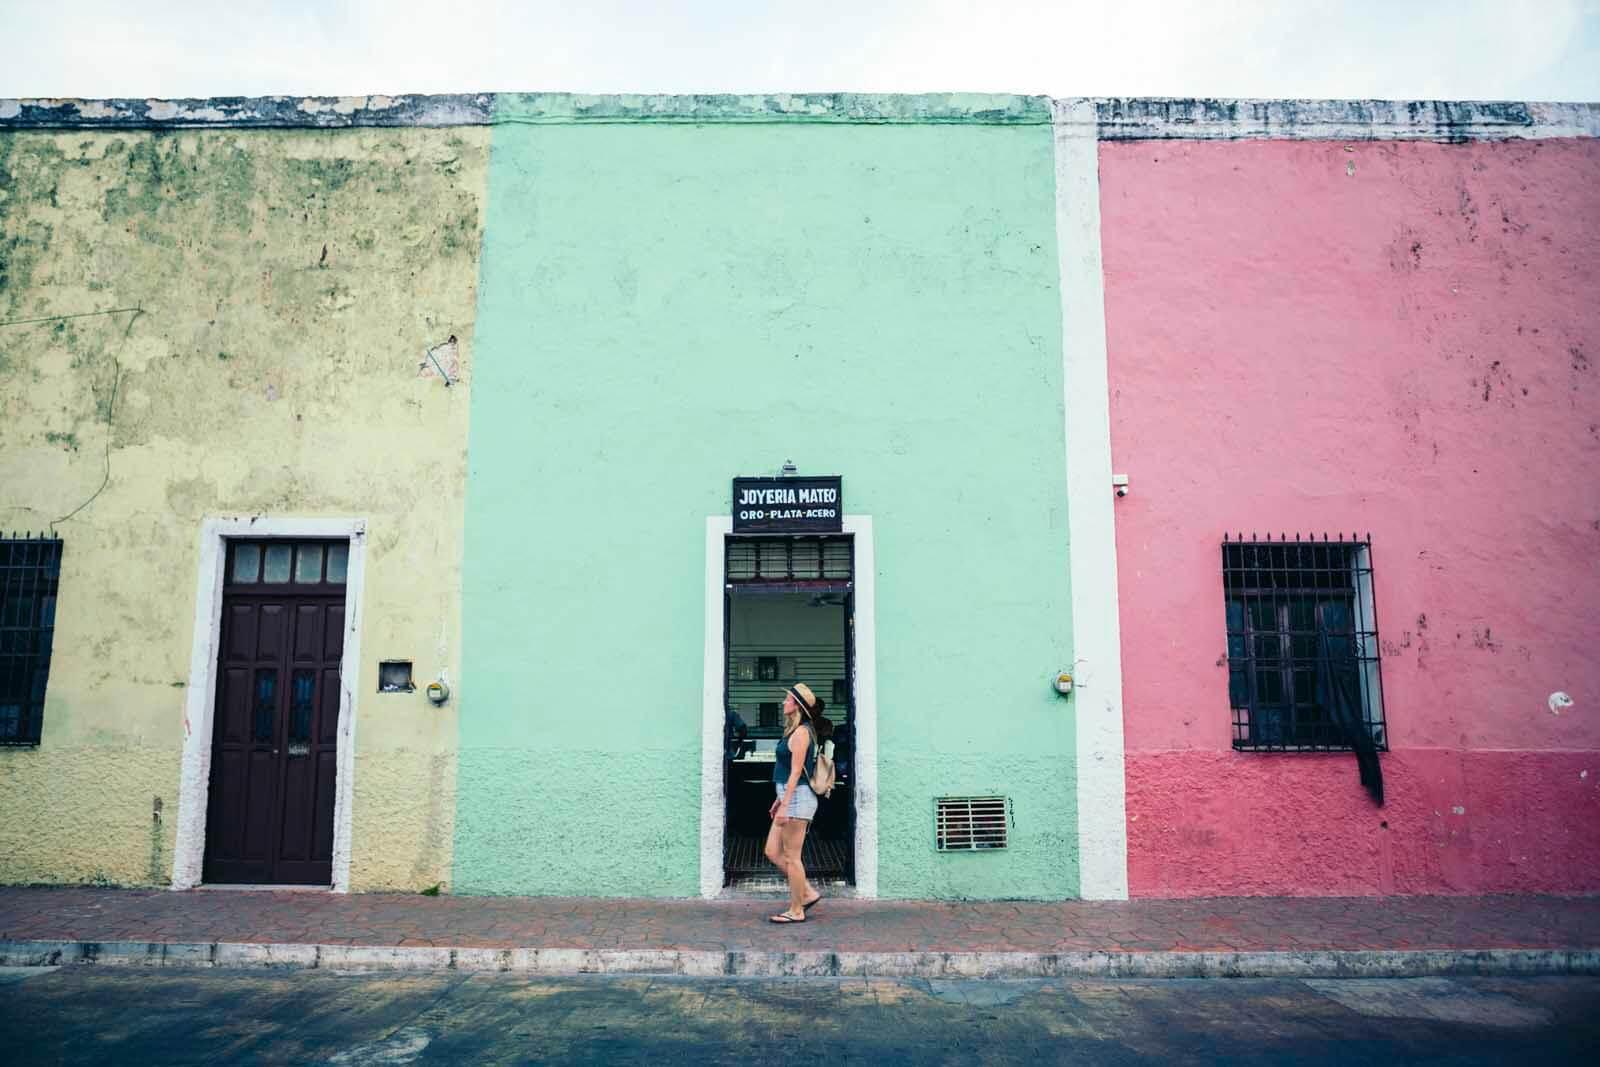 Megan walking through the streets of Valladolid